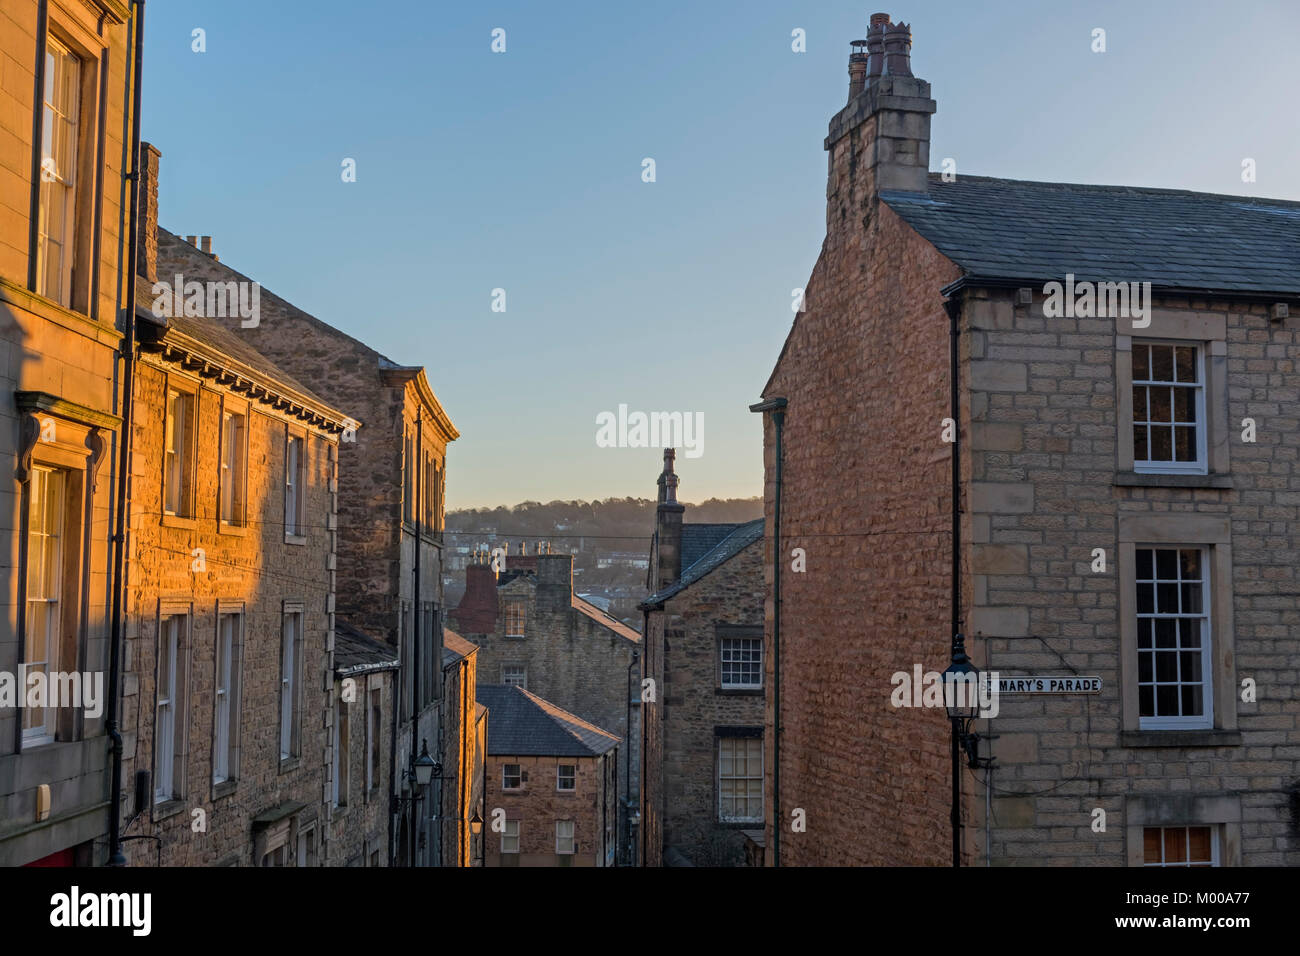 St Mary's Parade Castle Hill Lancaster Lancashire UK - Stock Image